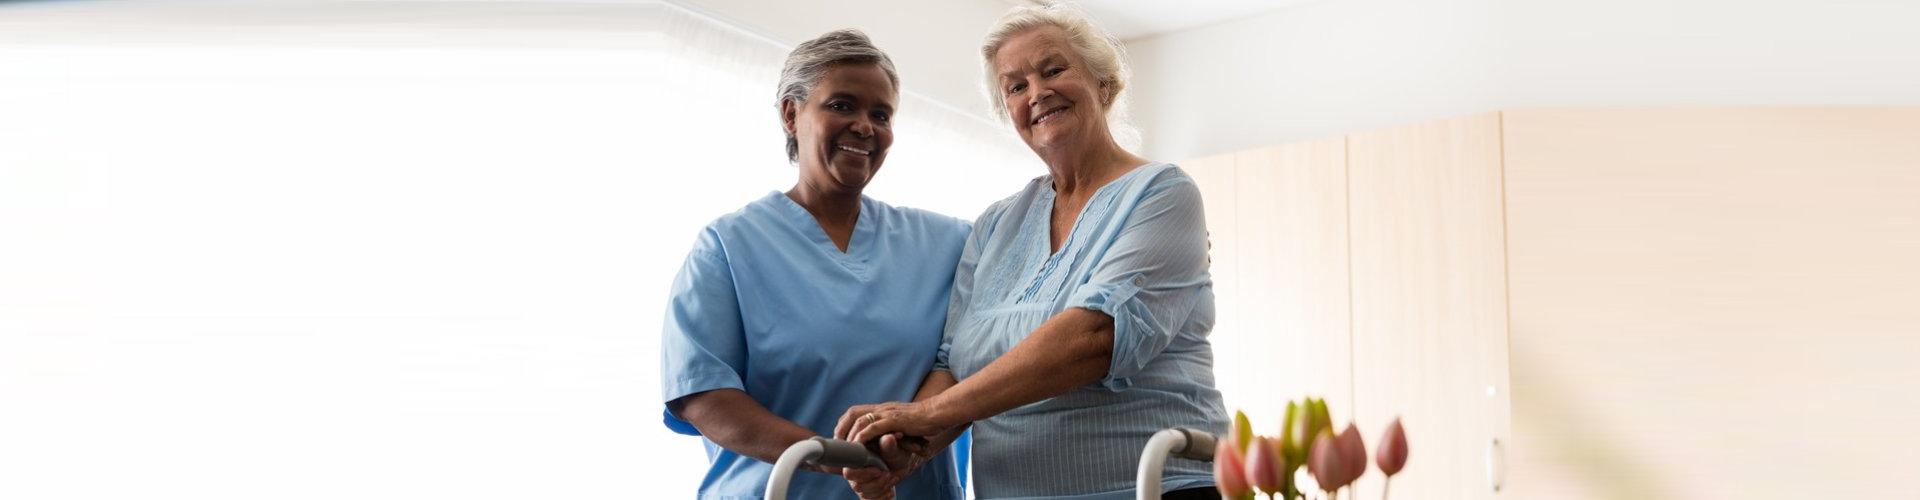 nurse standing by senior woman